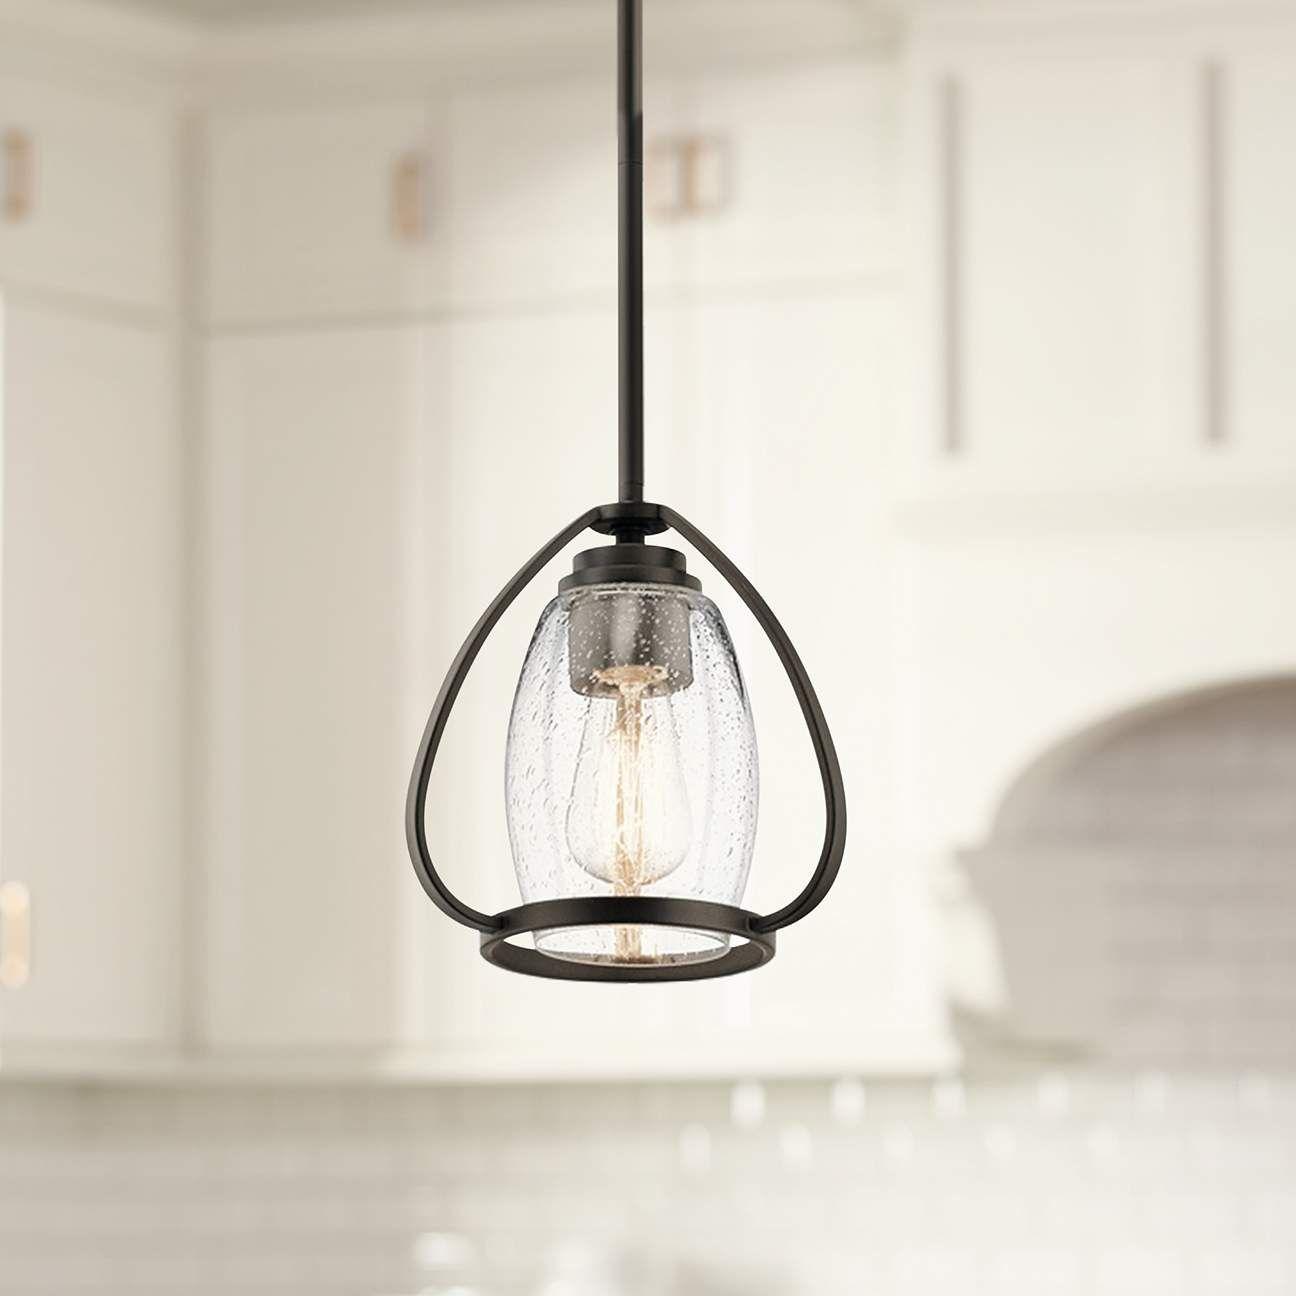 Kichler Tuscany 9 Wide Oiled Bronze Mini Pendant 42x59 Lamps Plus Chandelier Design Bronze Pendant Light Lamps Plus